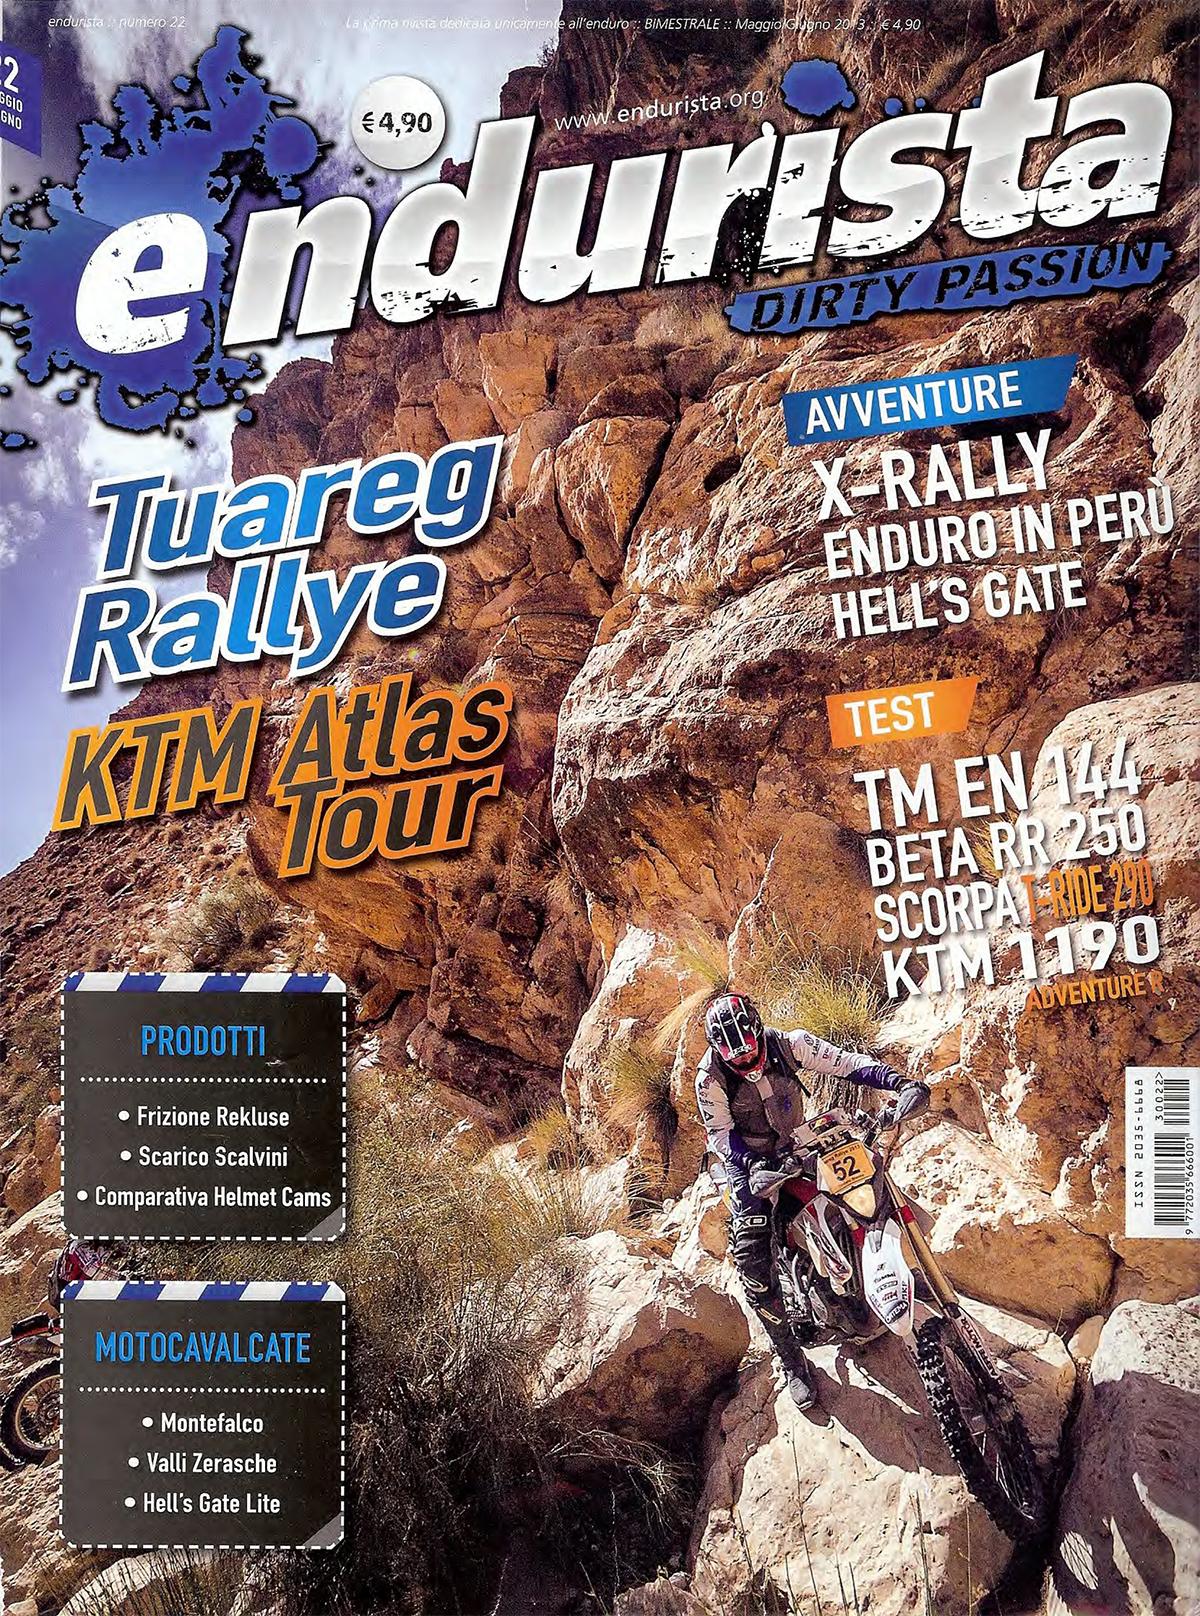 endurista magazine 1